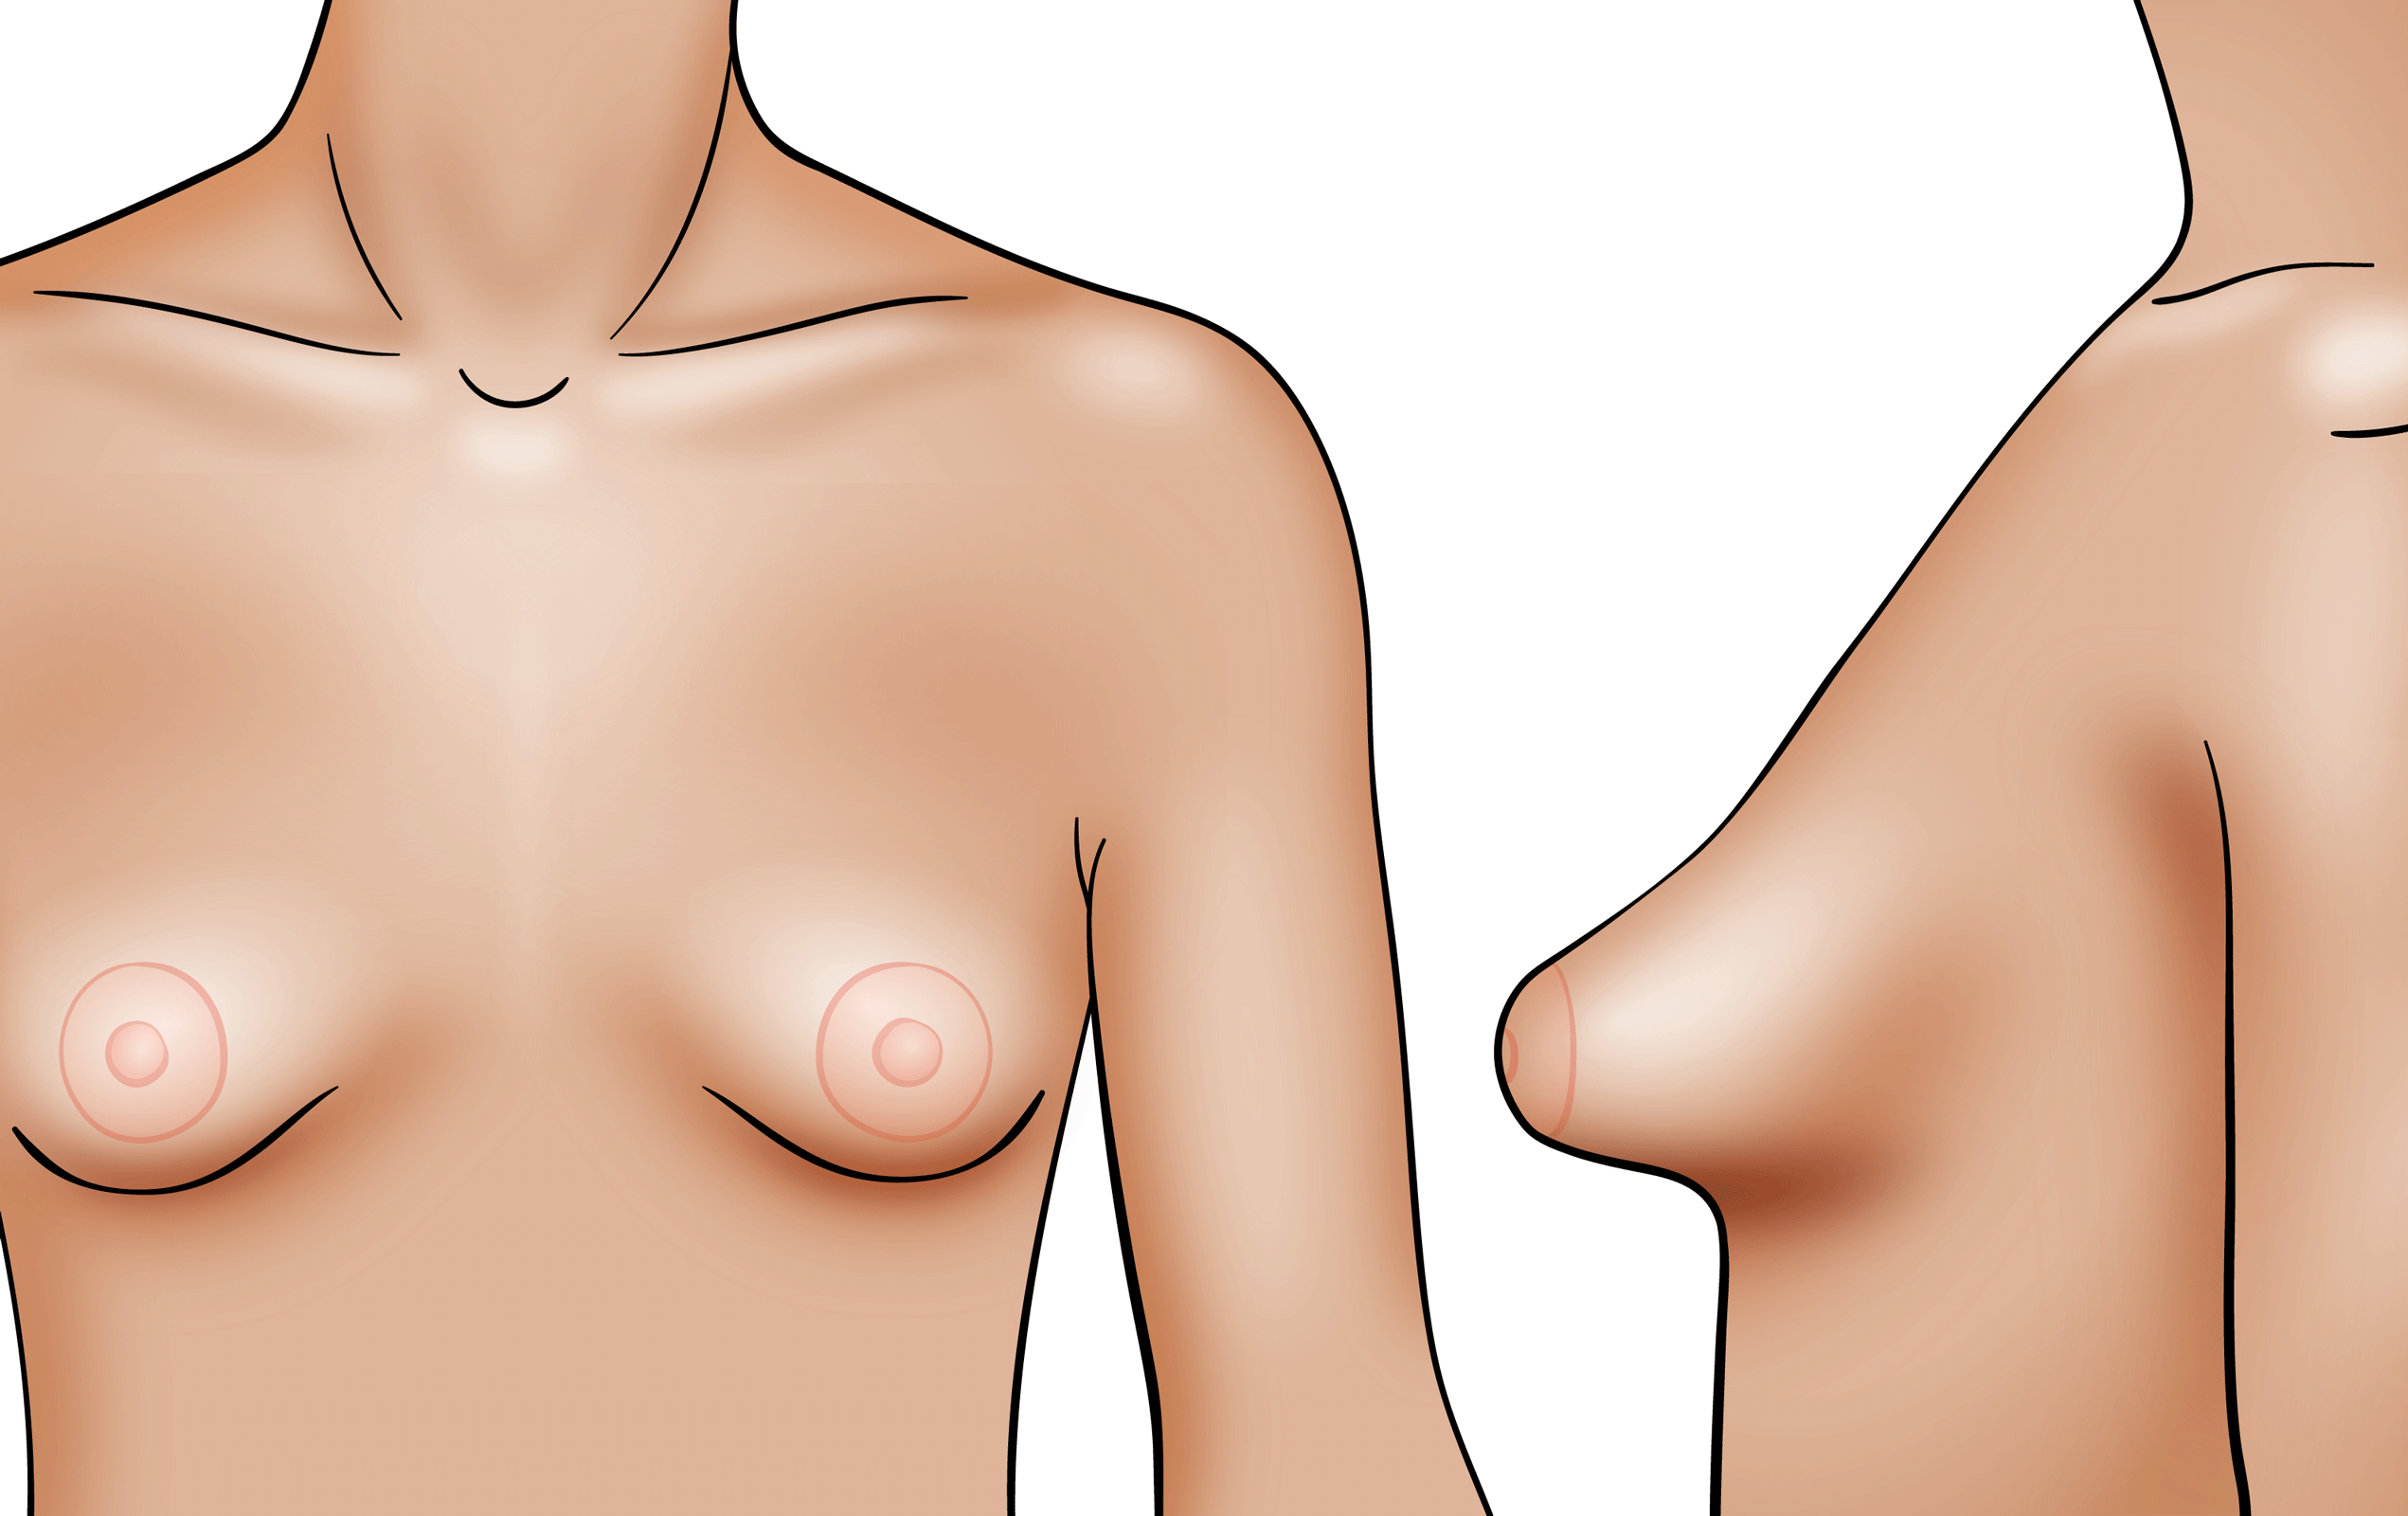 What do tubular breasts look like? Fix tuberous breasts Scottsdale AZ